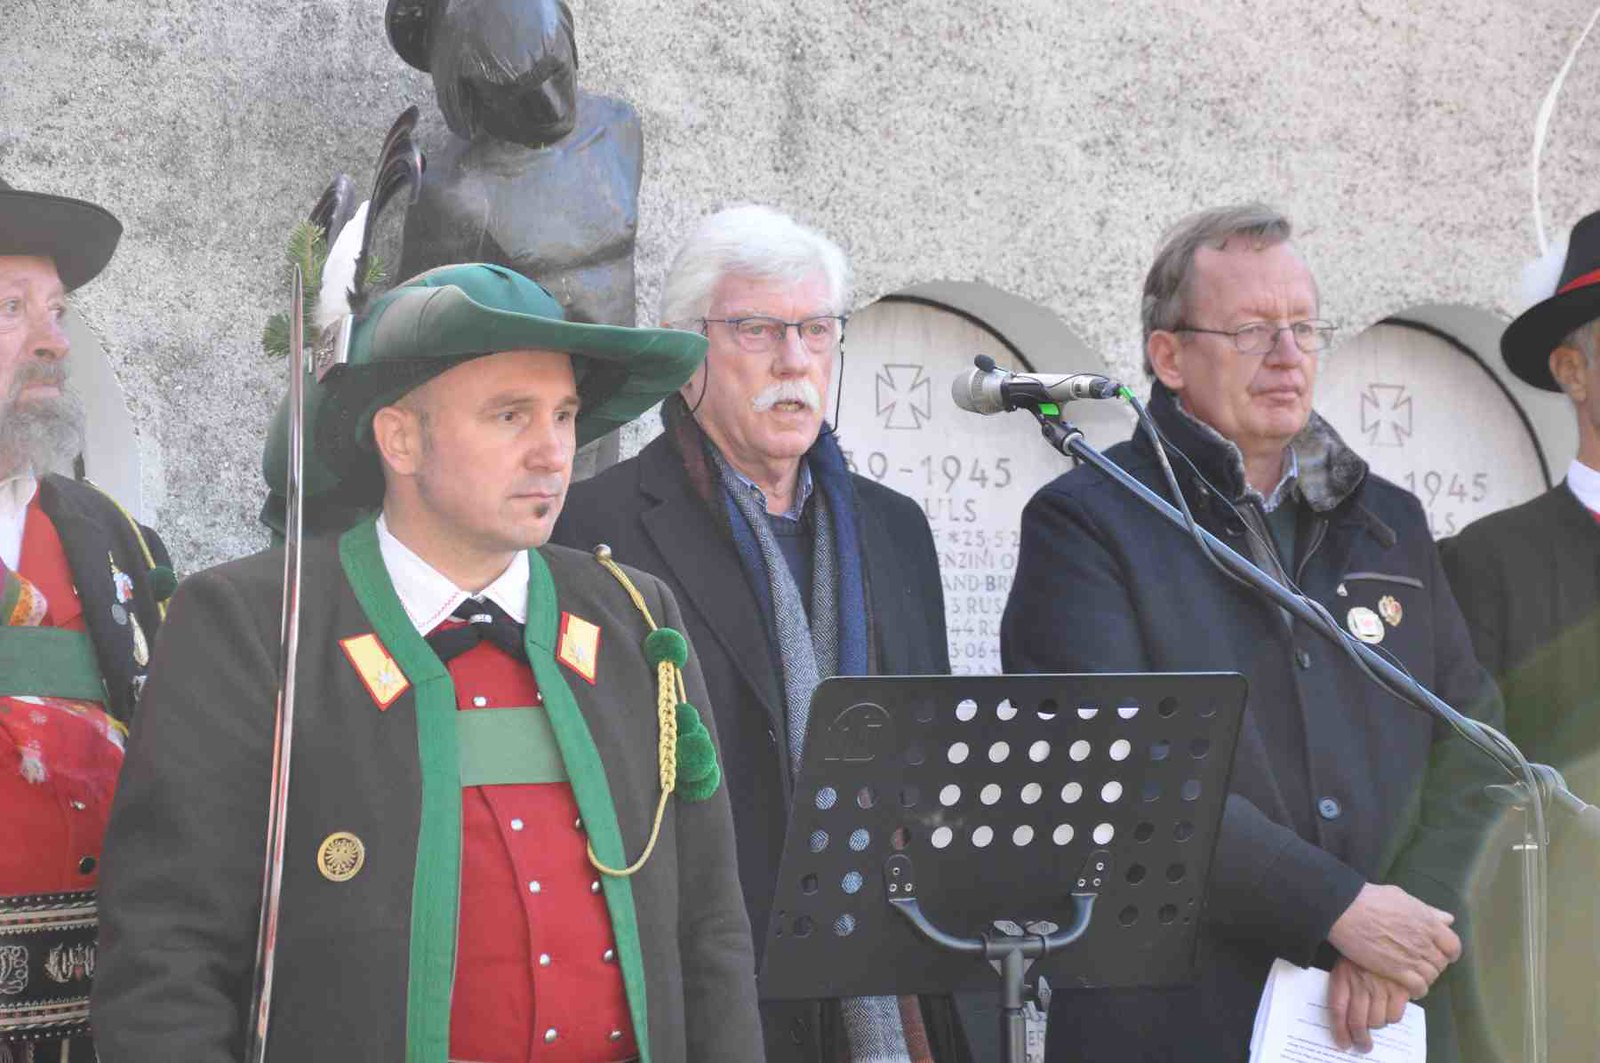 Sepp Kerschbaumer Gedenkfeier, St. Pauls, 8.12.2018